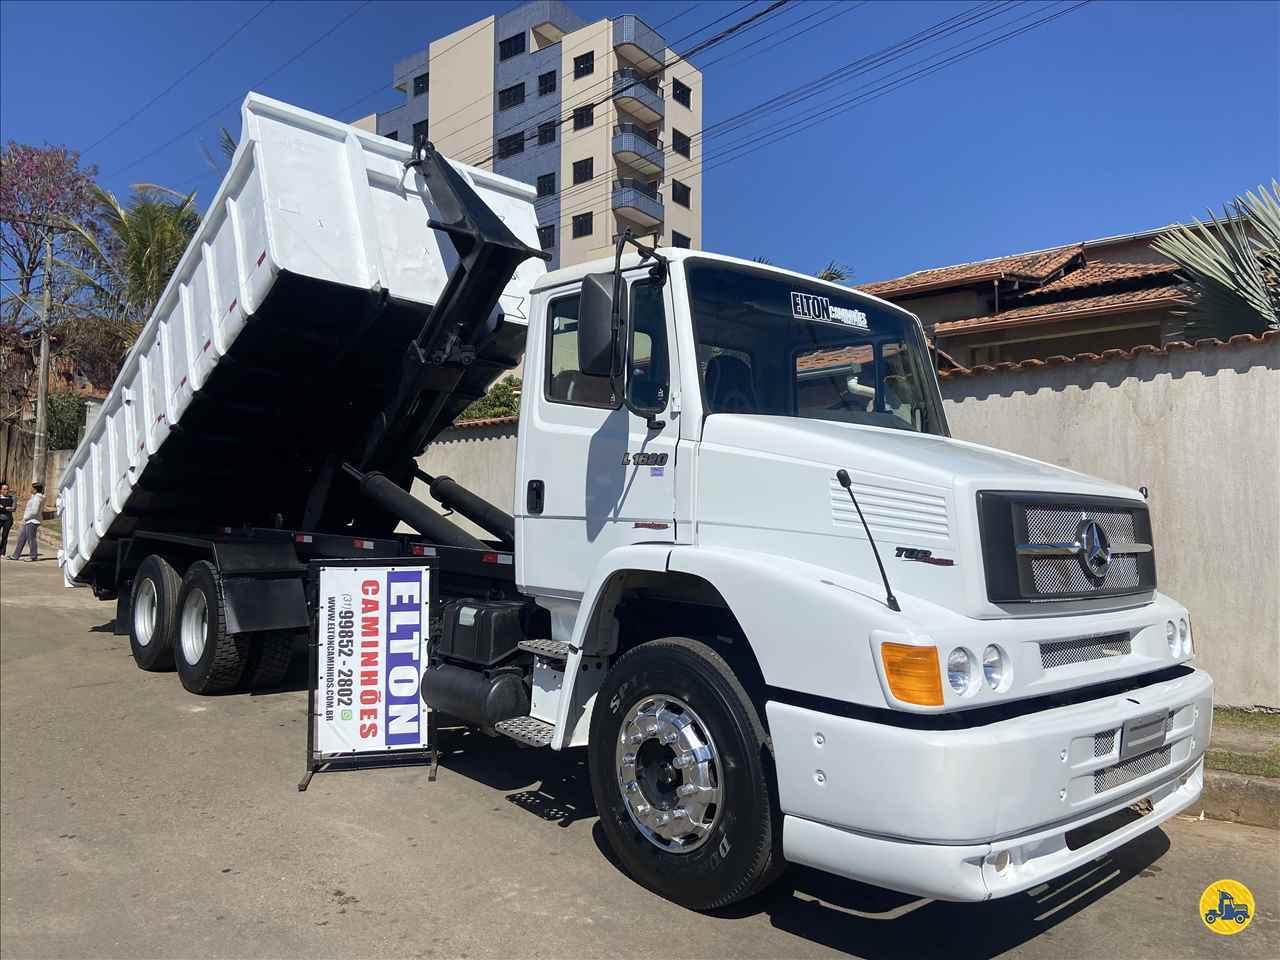 CAMINHAO MERCEDES-BENZ MB 1620 Roll ON OFF Truck 6x2 Elton Caminhões JOAO MONLEVADE MINAS GERAIS MG